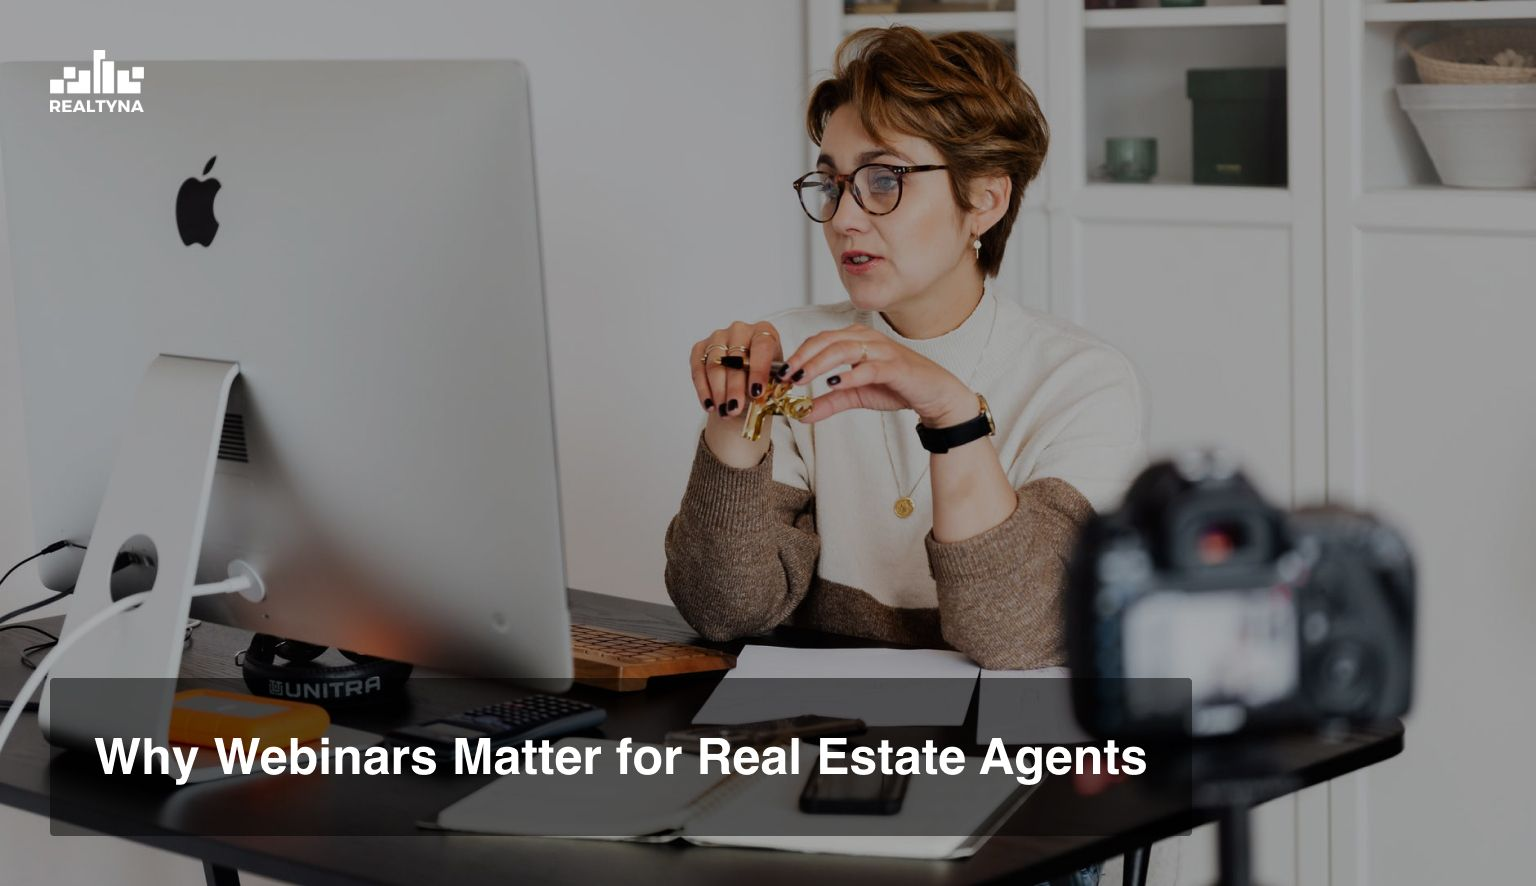 Real estate webinars